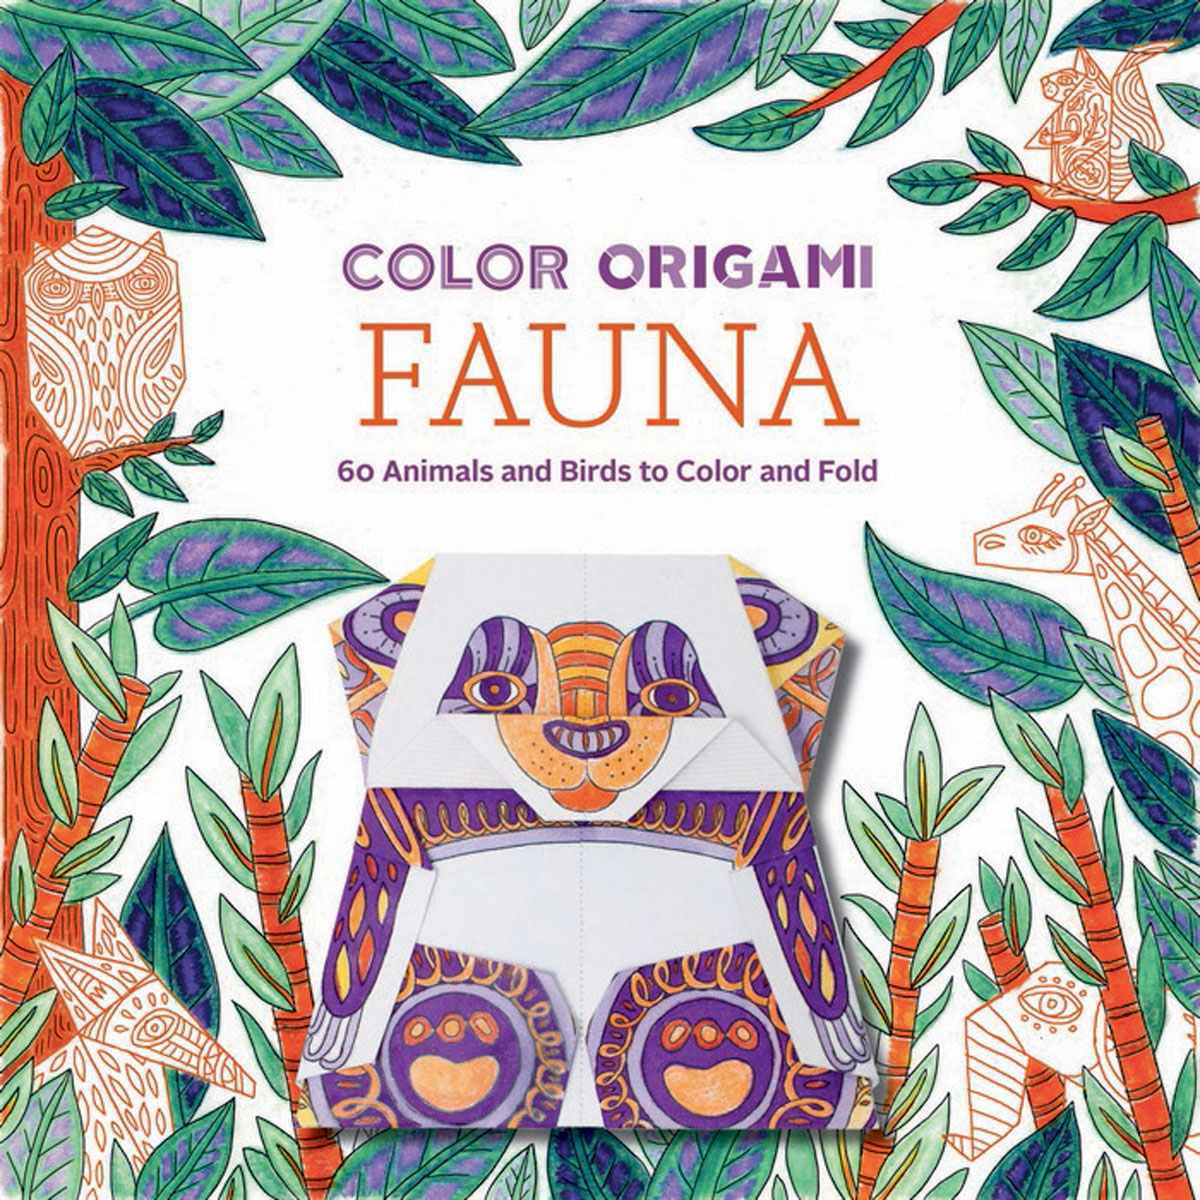 Color Origami: Fauna (Adult Coloring Book) the peacocks of baboquivari